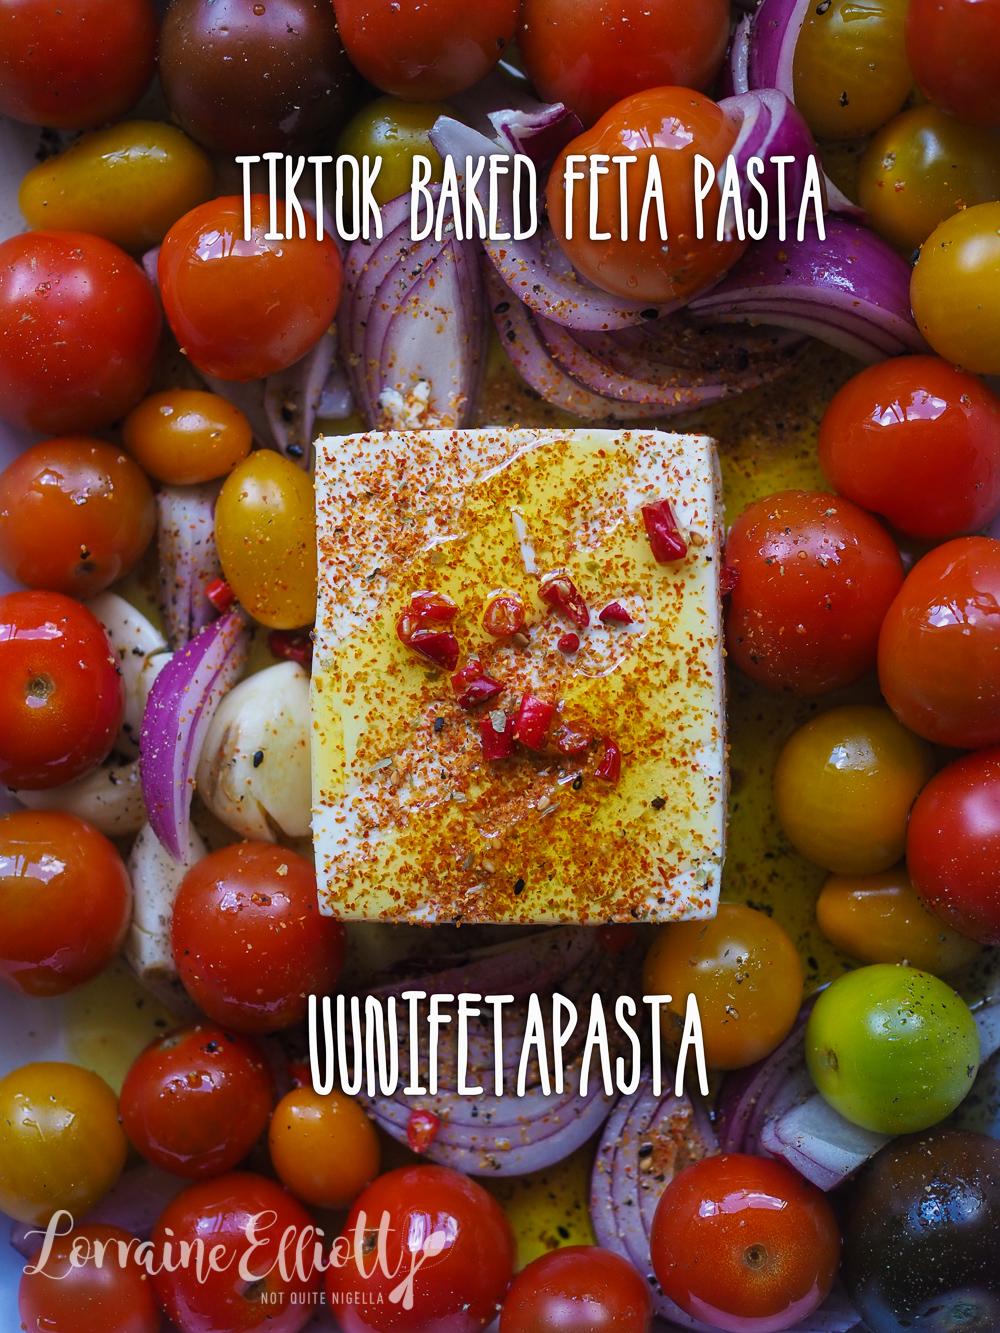 TikTok Baked Feta Pasta Recipe Uunifetapasta